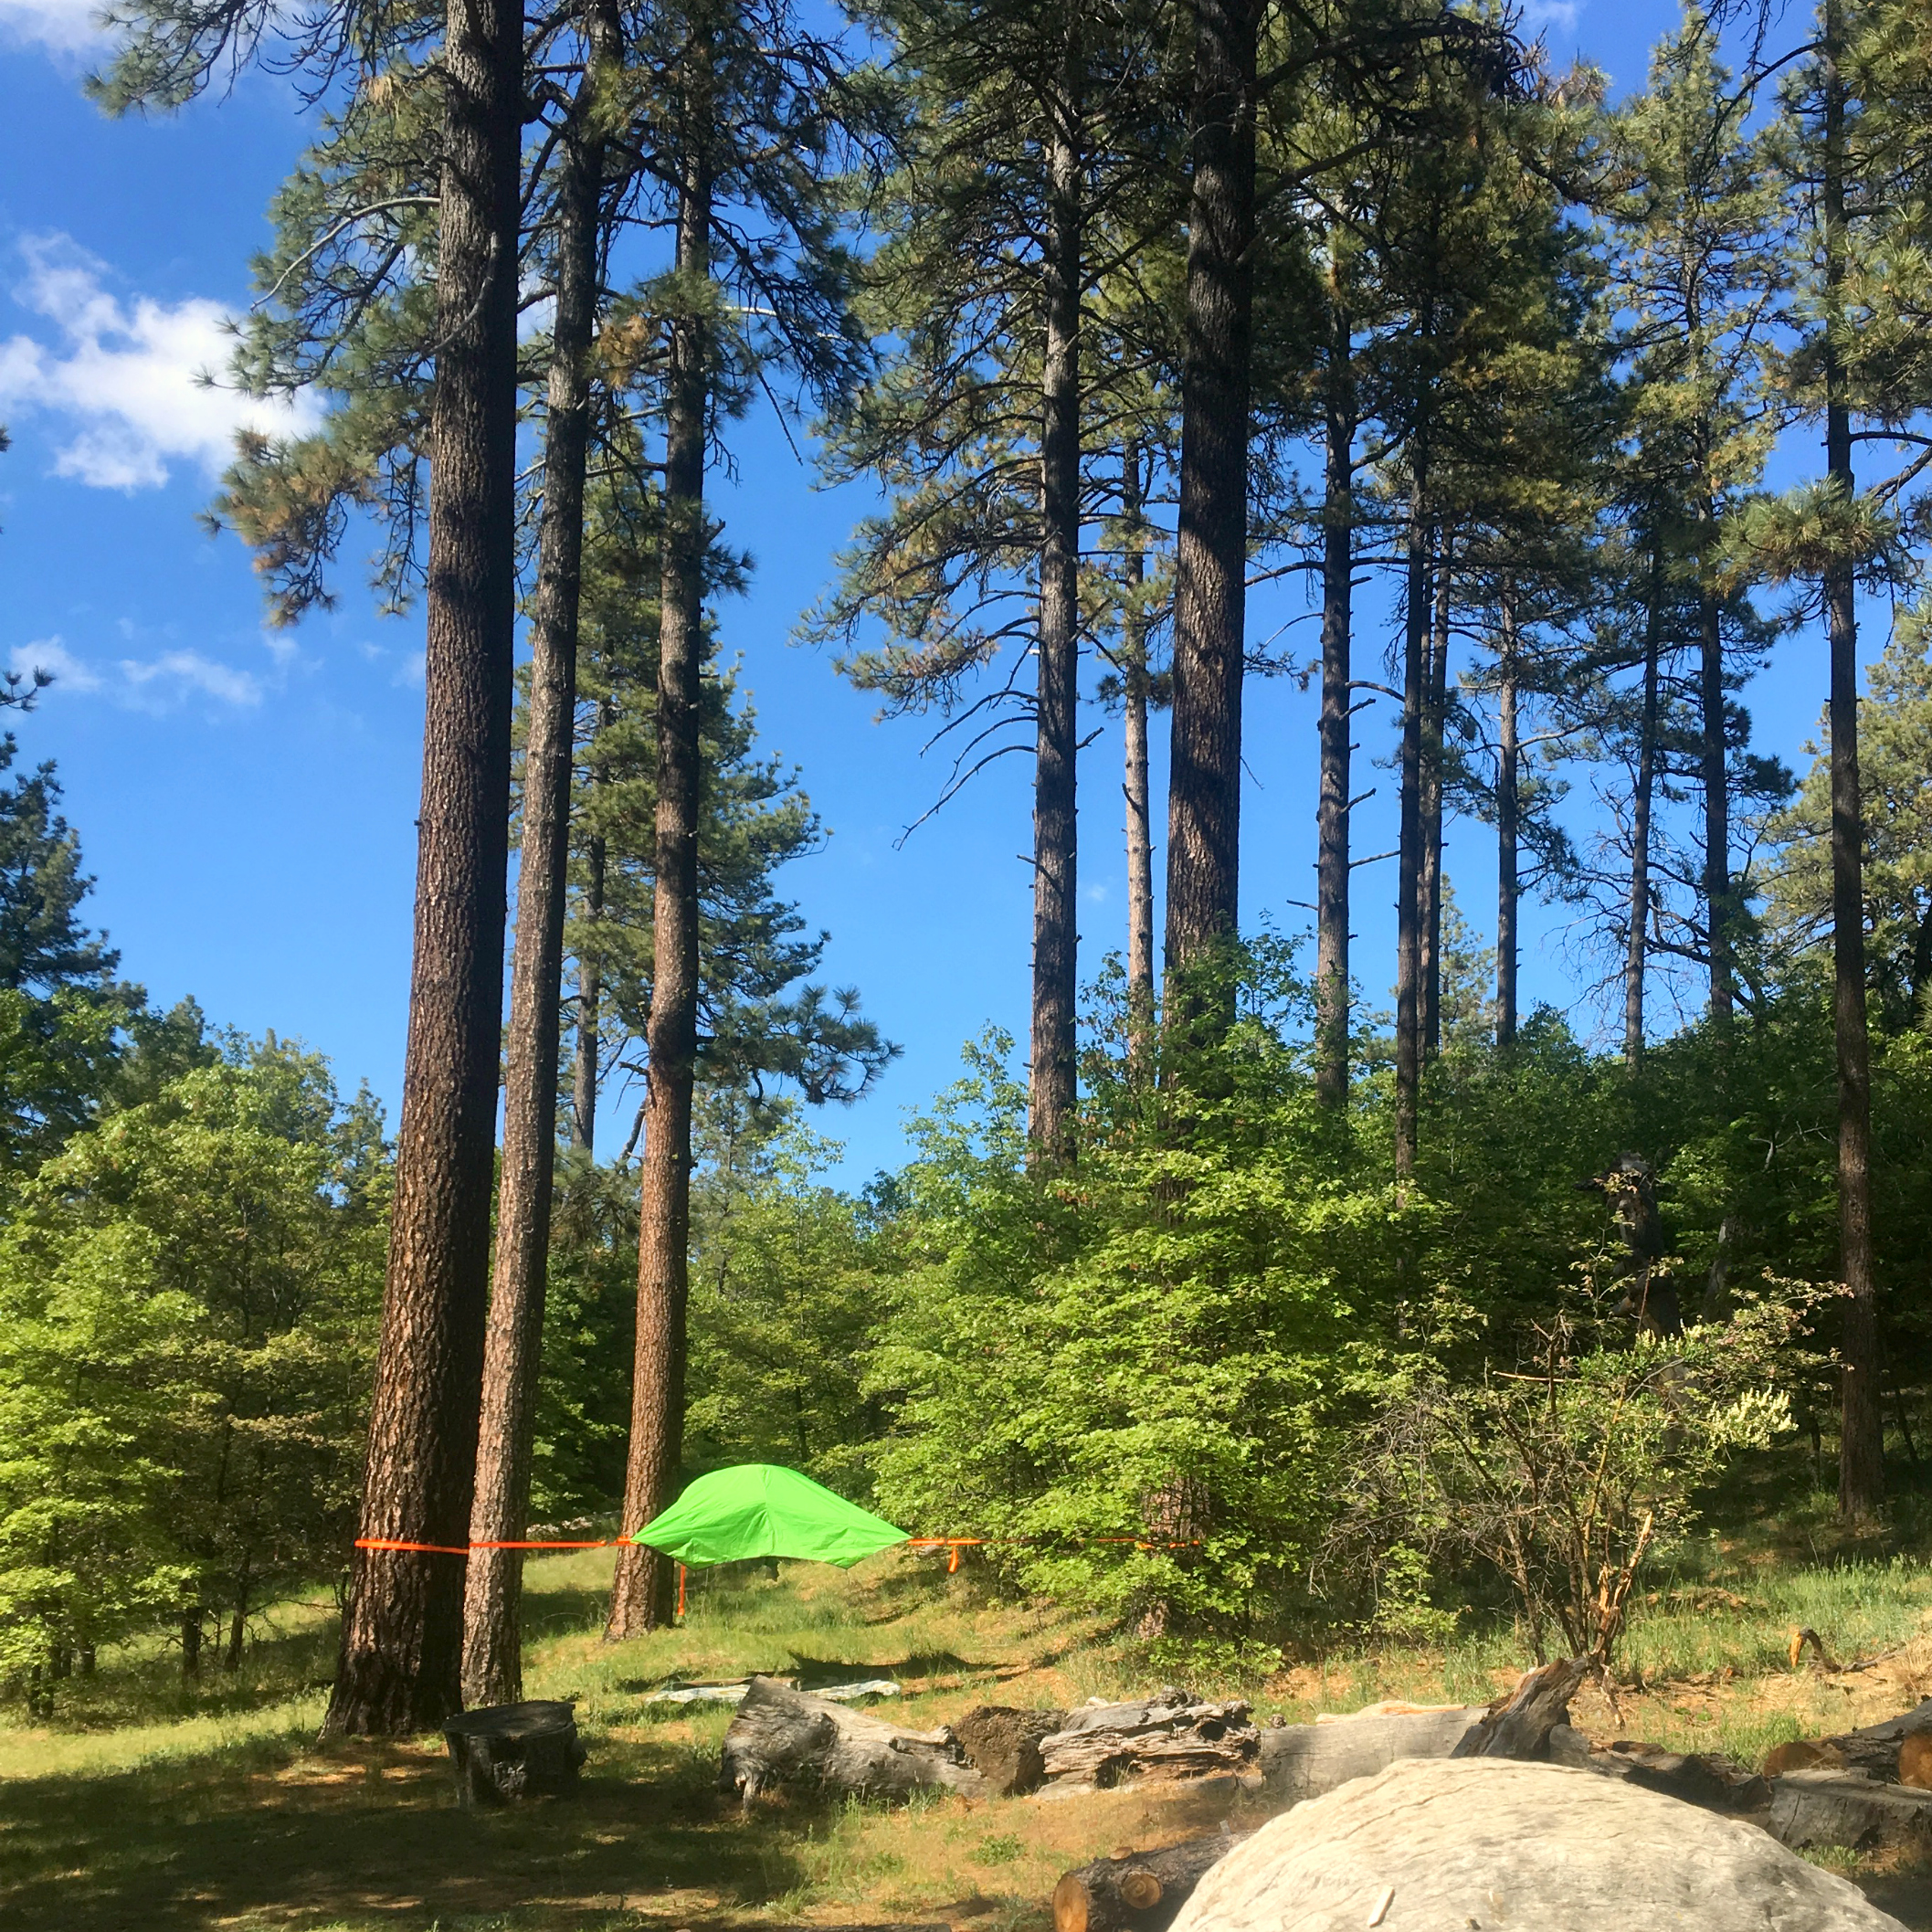 Laguna el Prado group campground, Airbnb